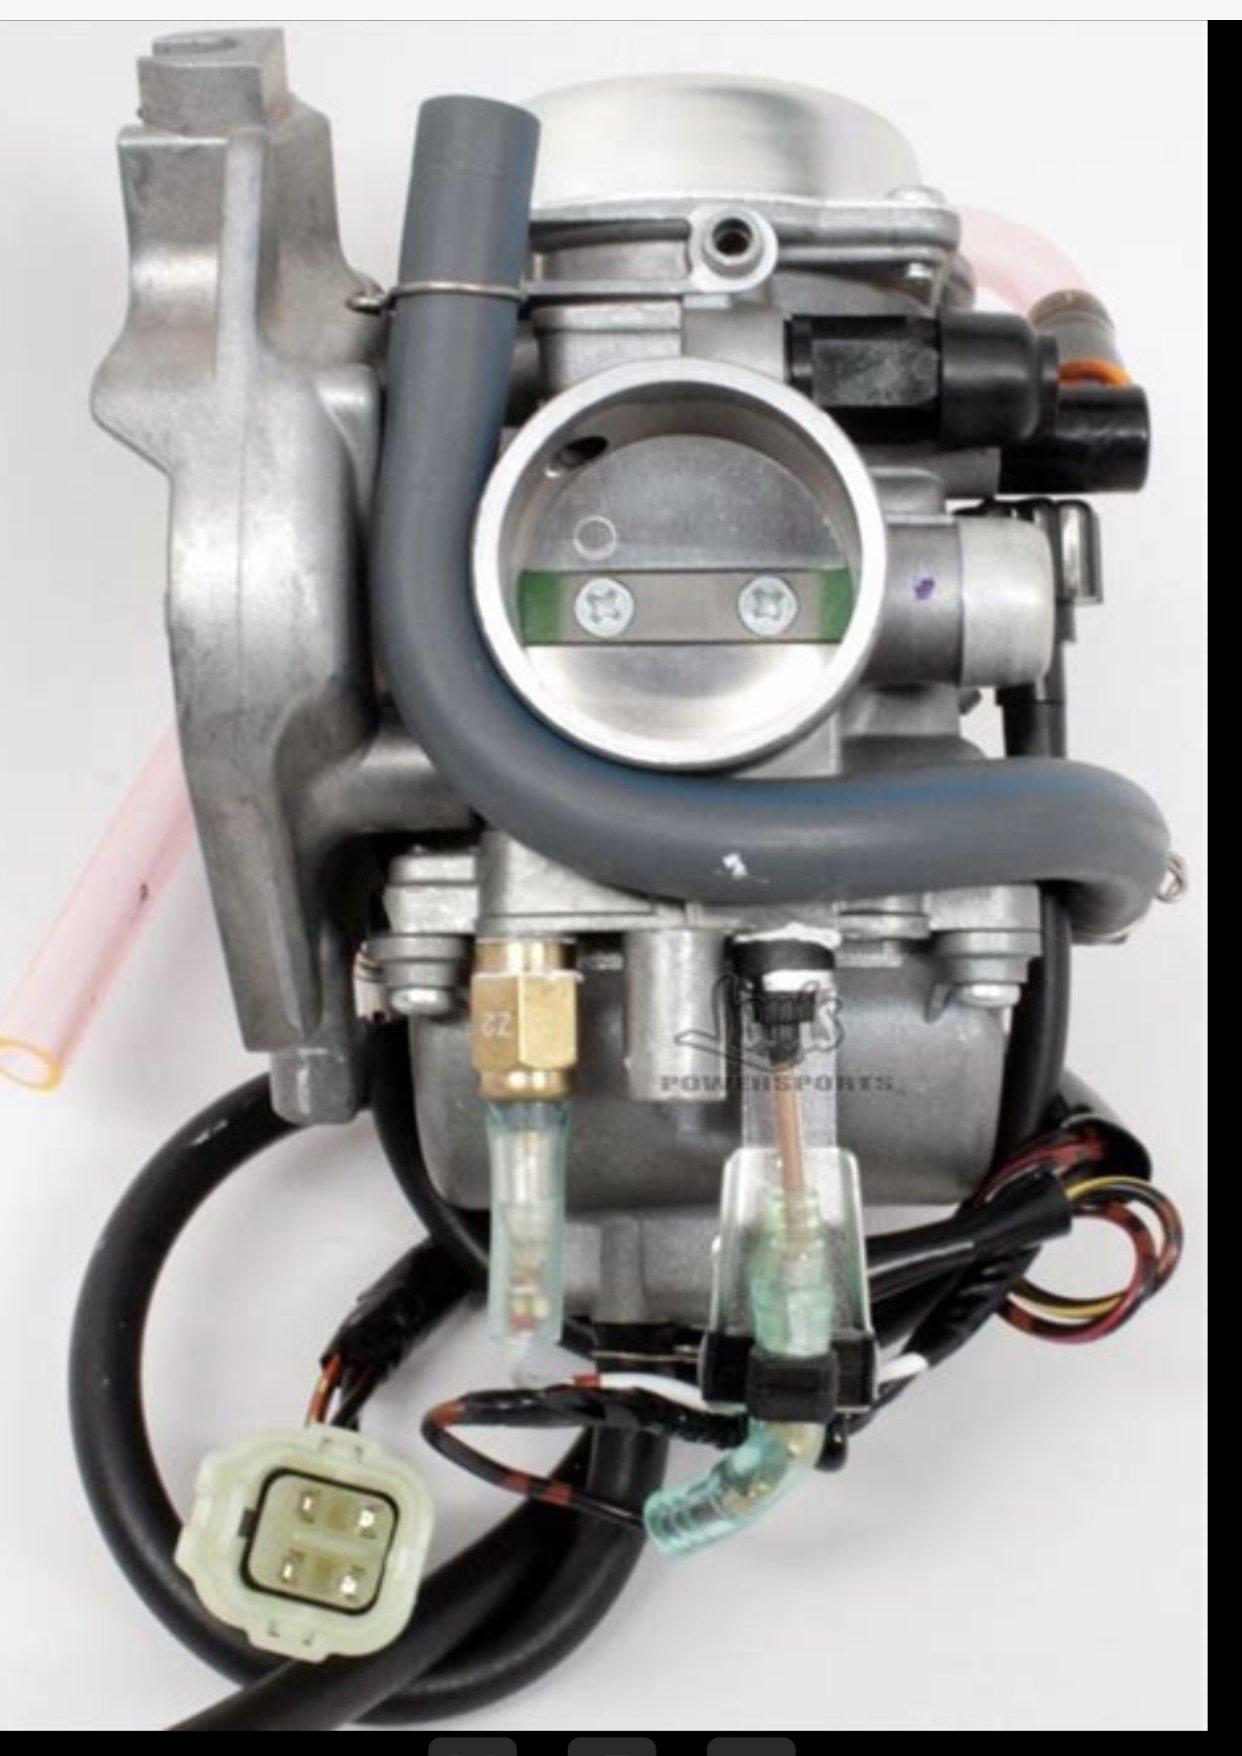 2002 Kawasaki Prairie 300 Wiring Diagram Clearance For Fuse Box In House Begeboy Wiring Diagram Source